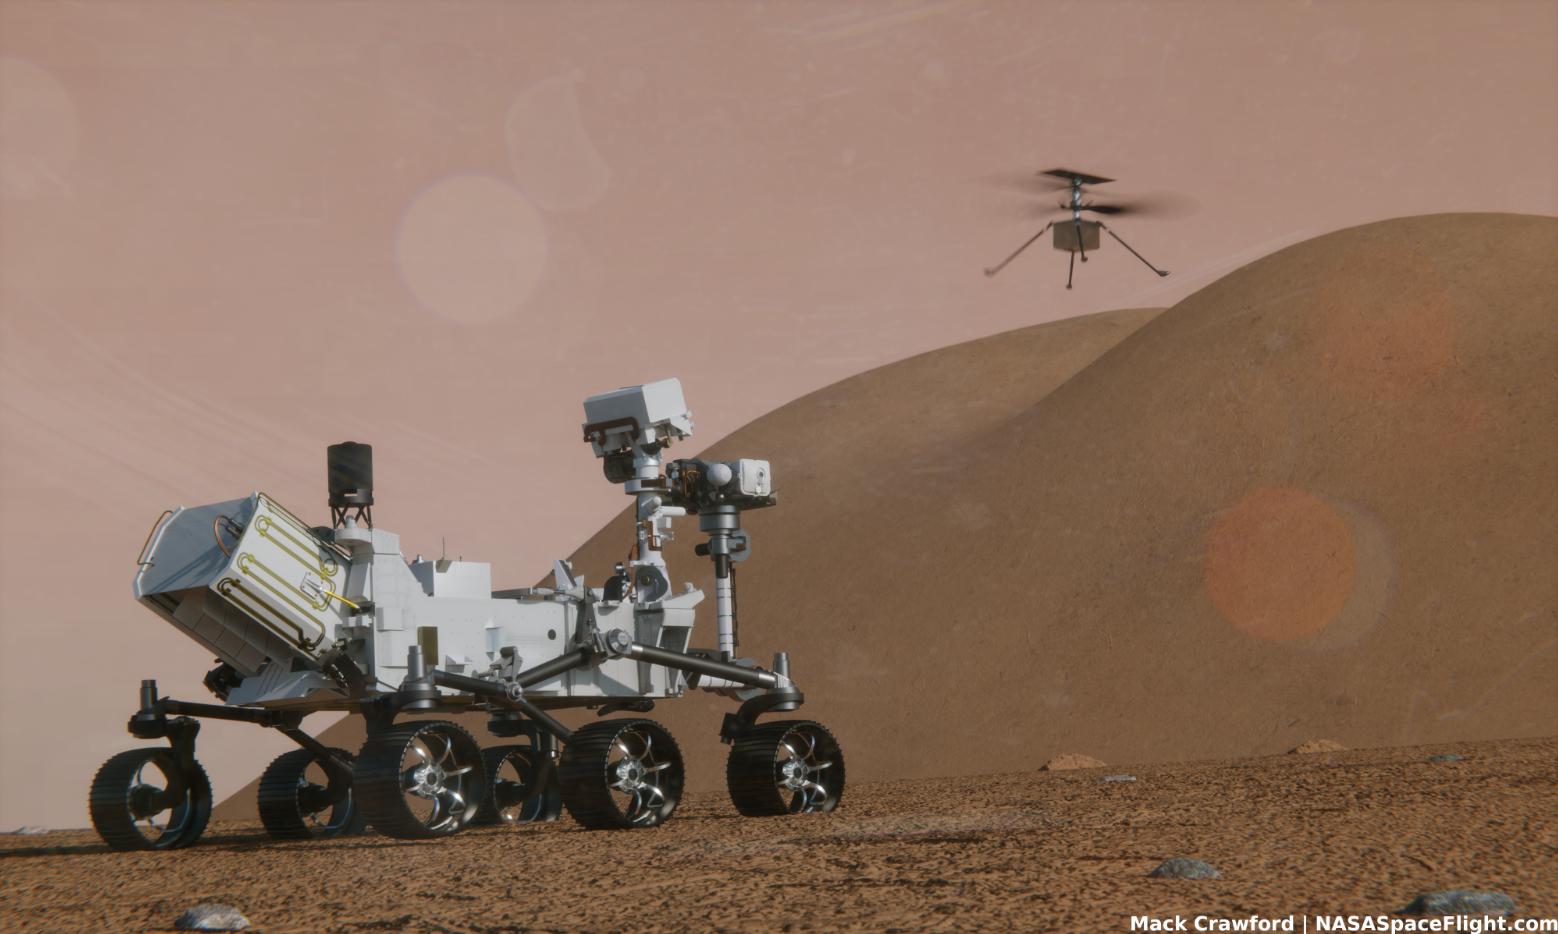 NASA preparing to fly Ingenuity Mars drone enabling future airborne missions – NASASpaceFlight.com – NASASpaceflight.com